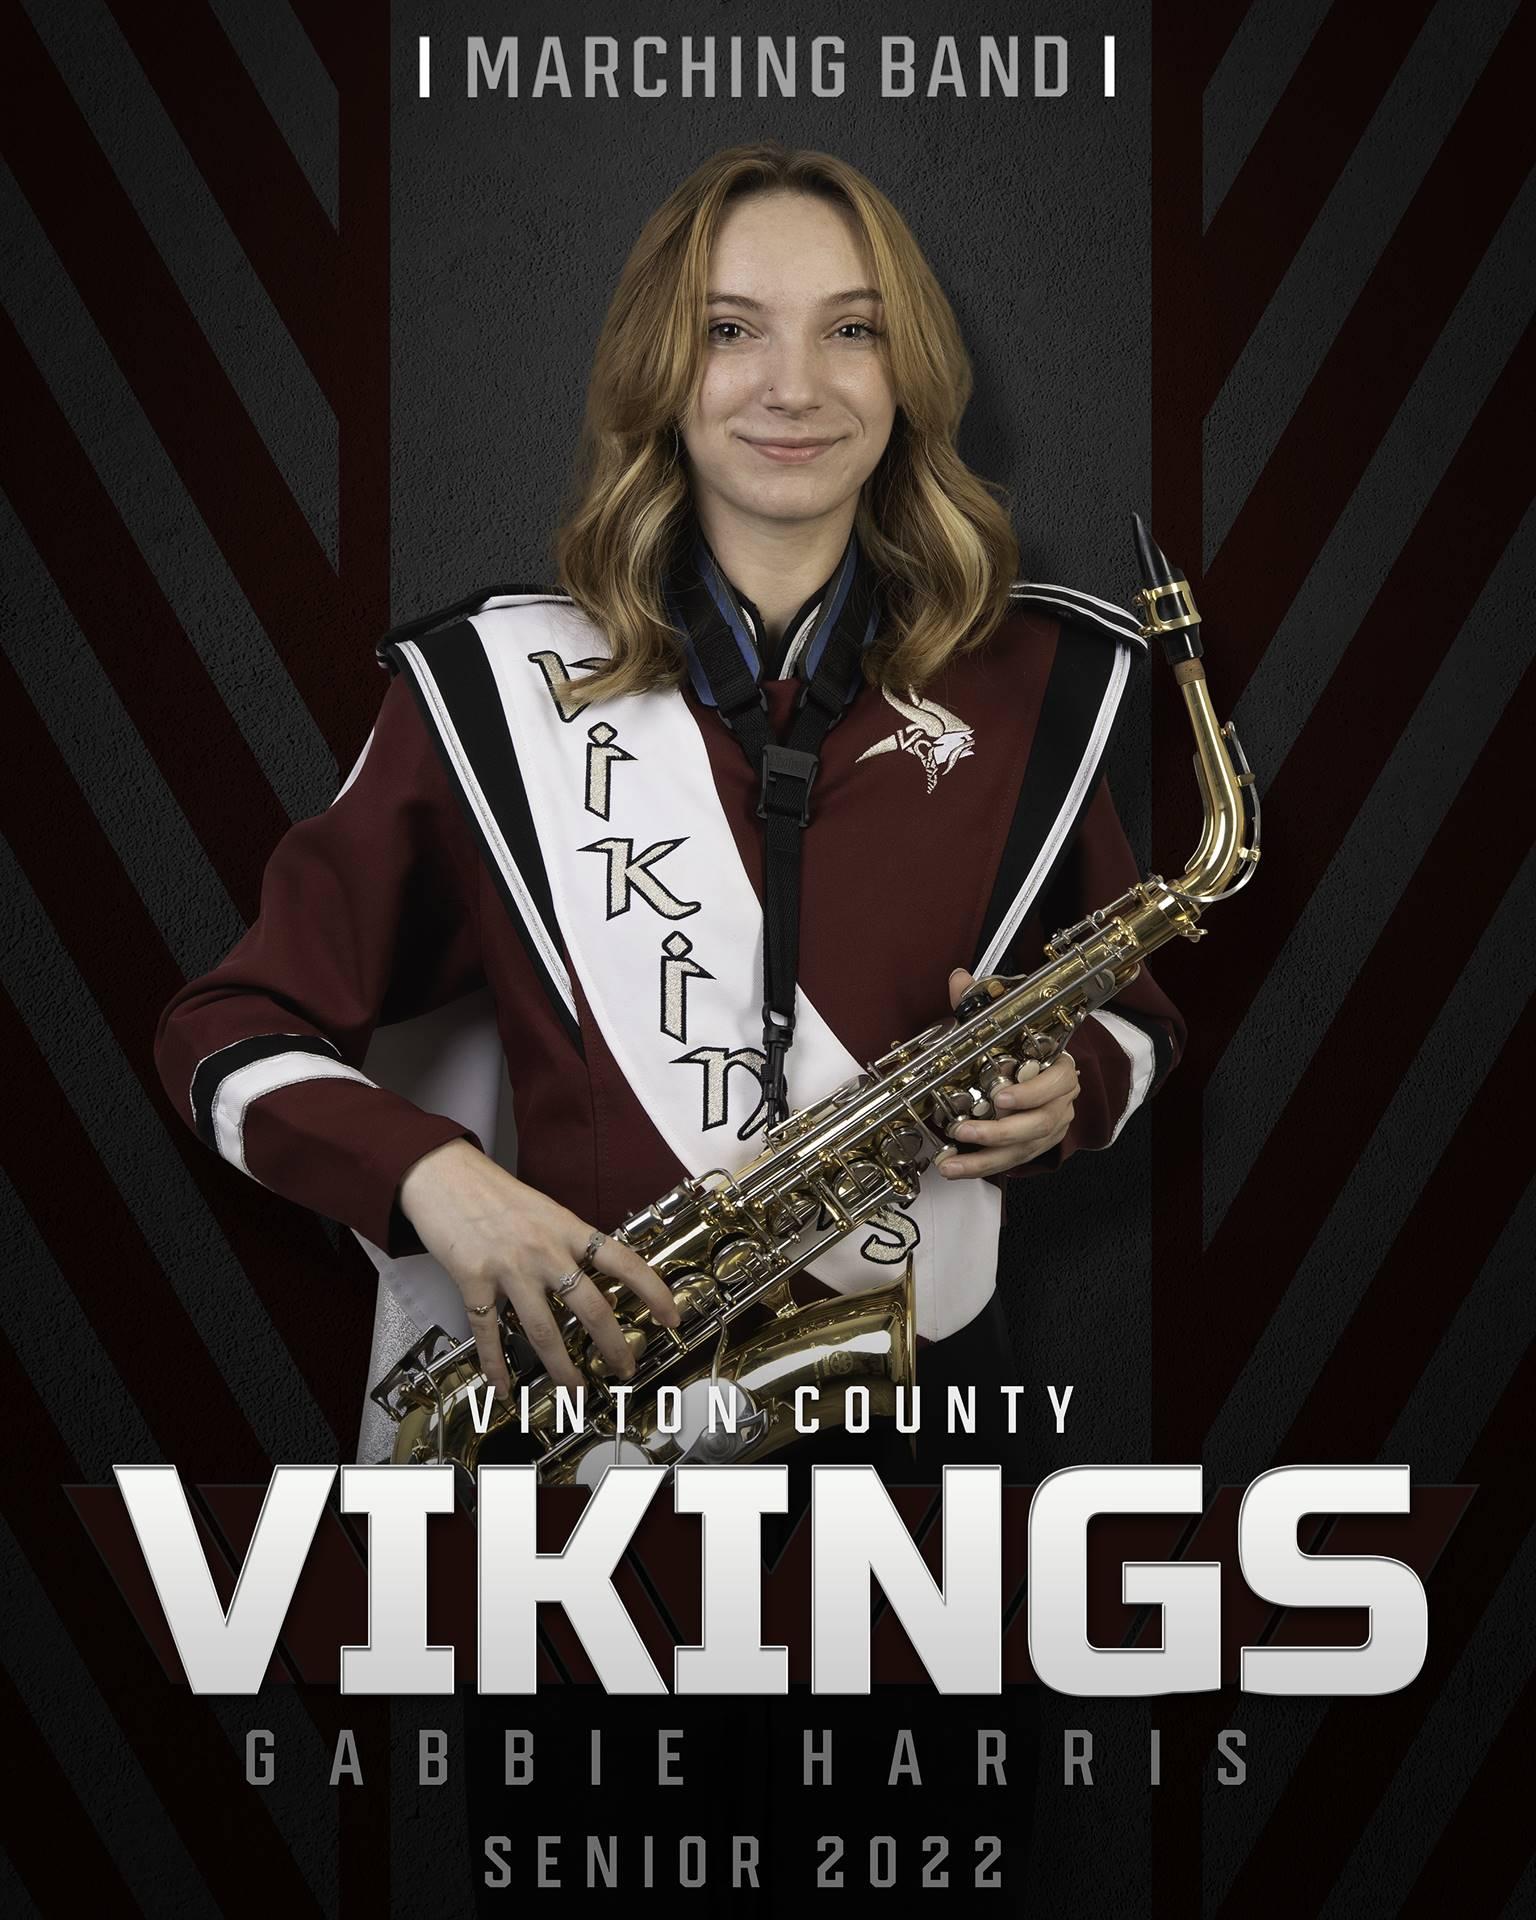 Gabbie Harris - Band